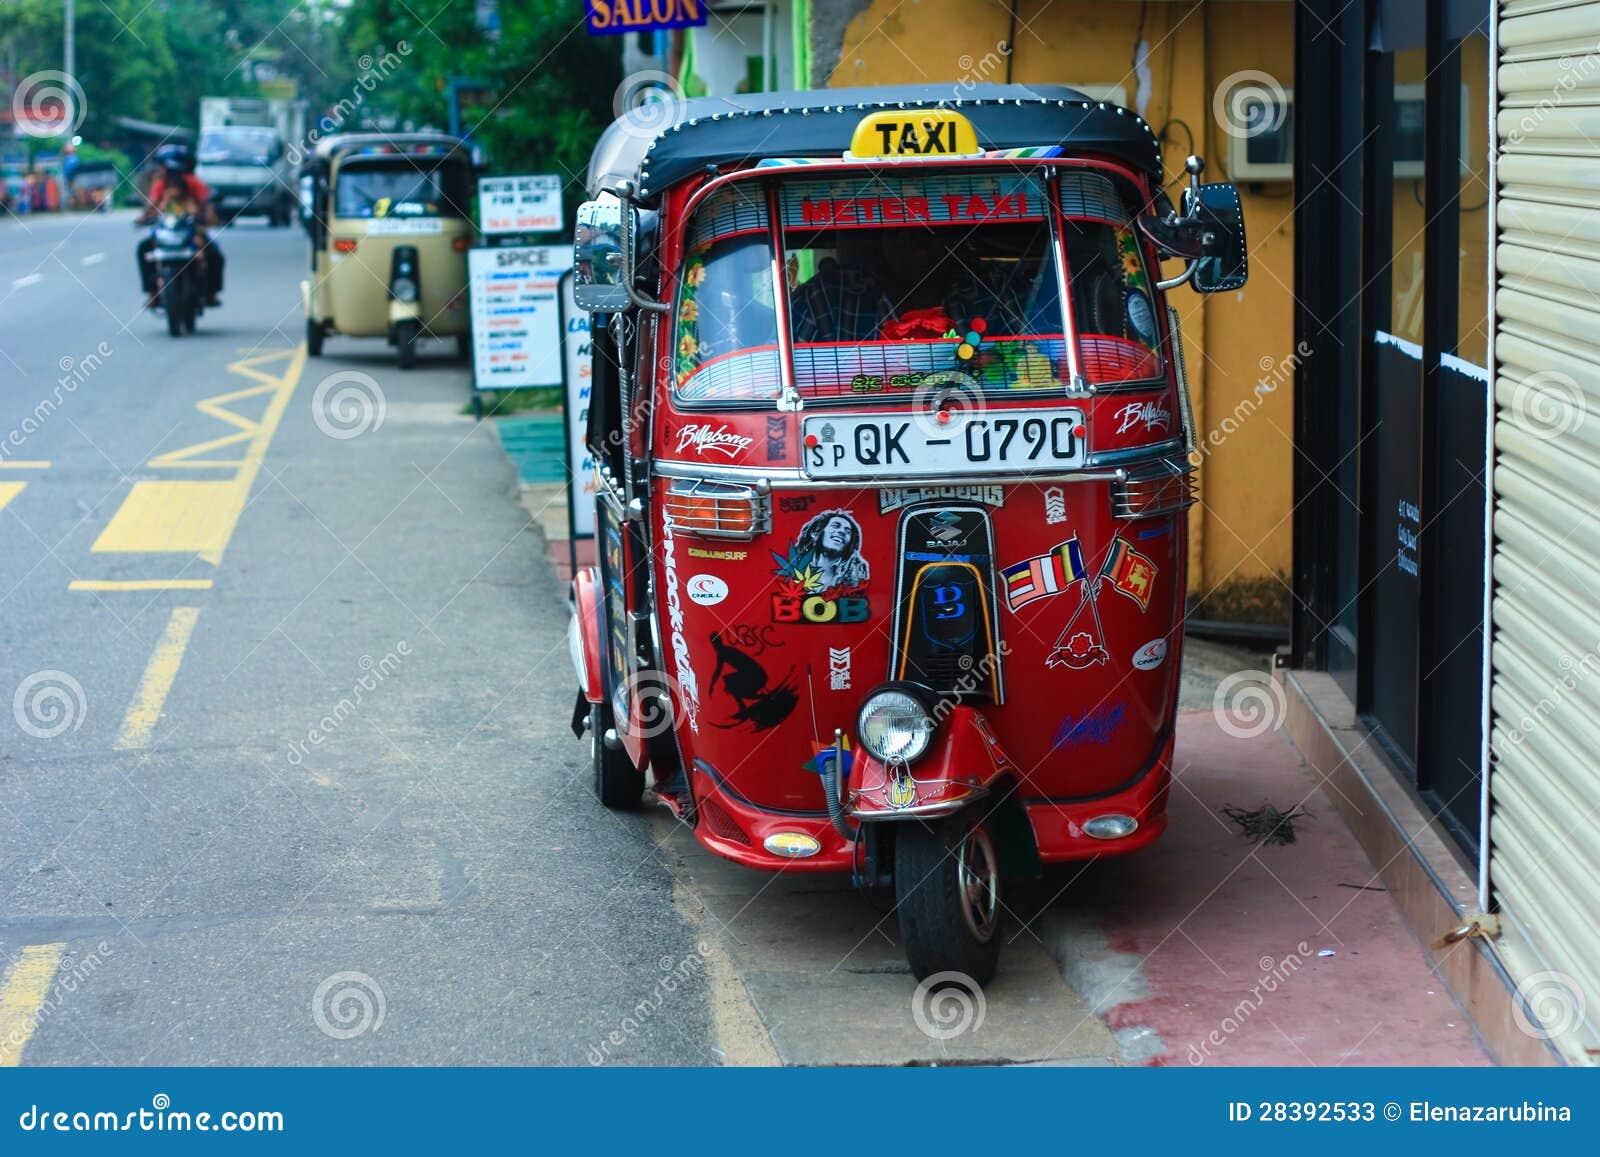 transportation in sri lanka pdf